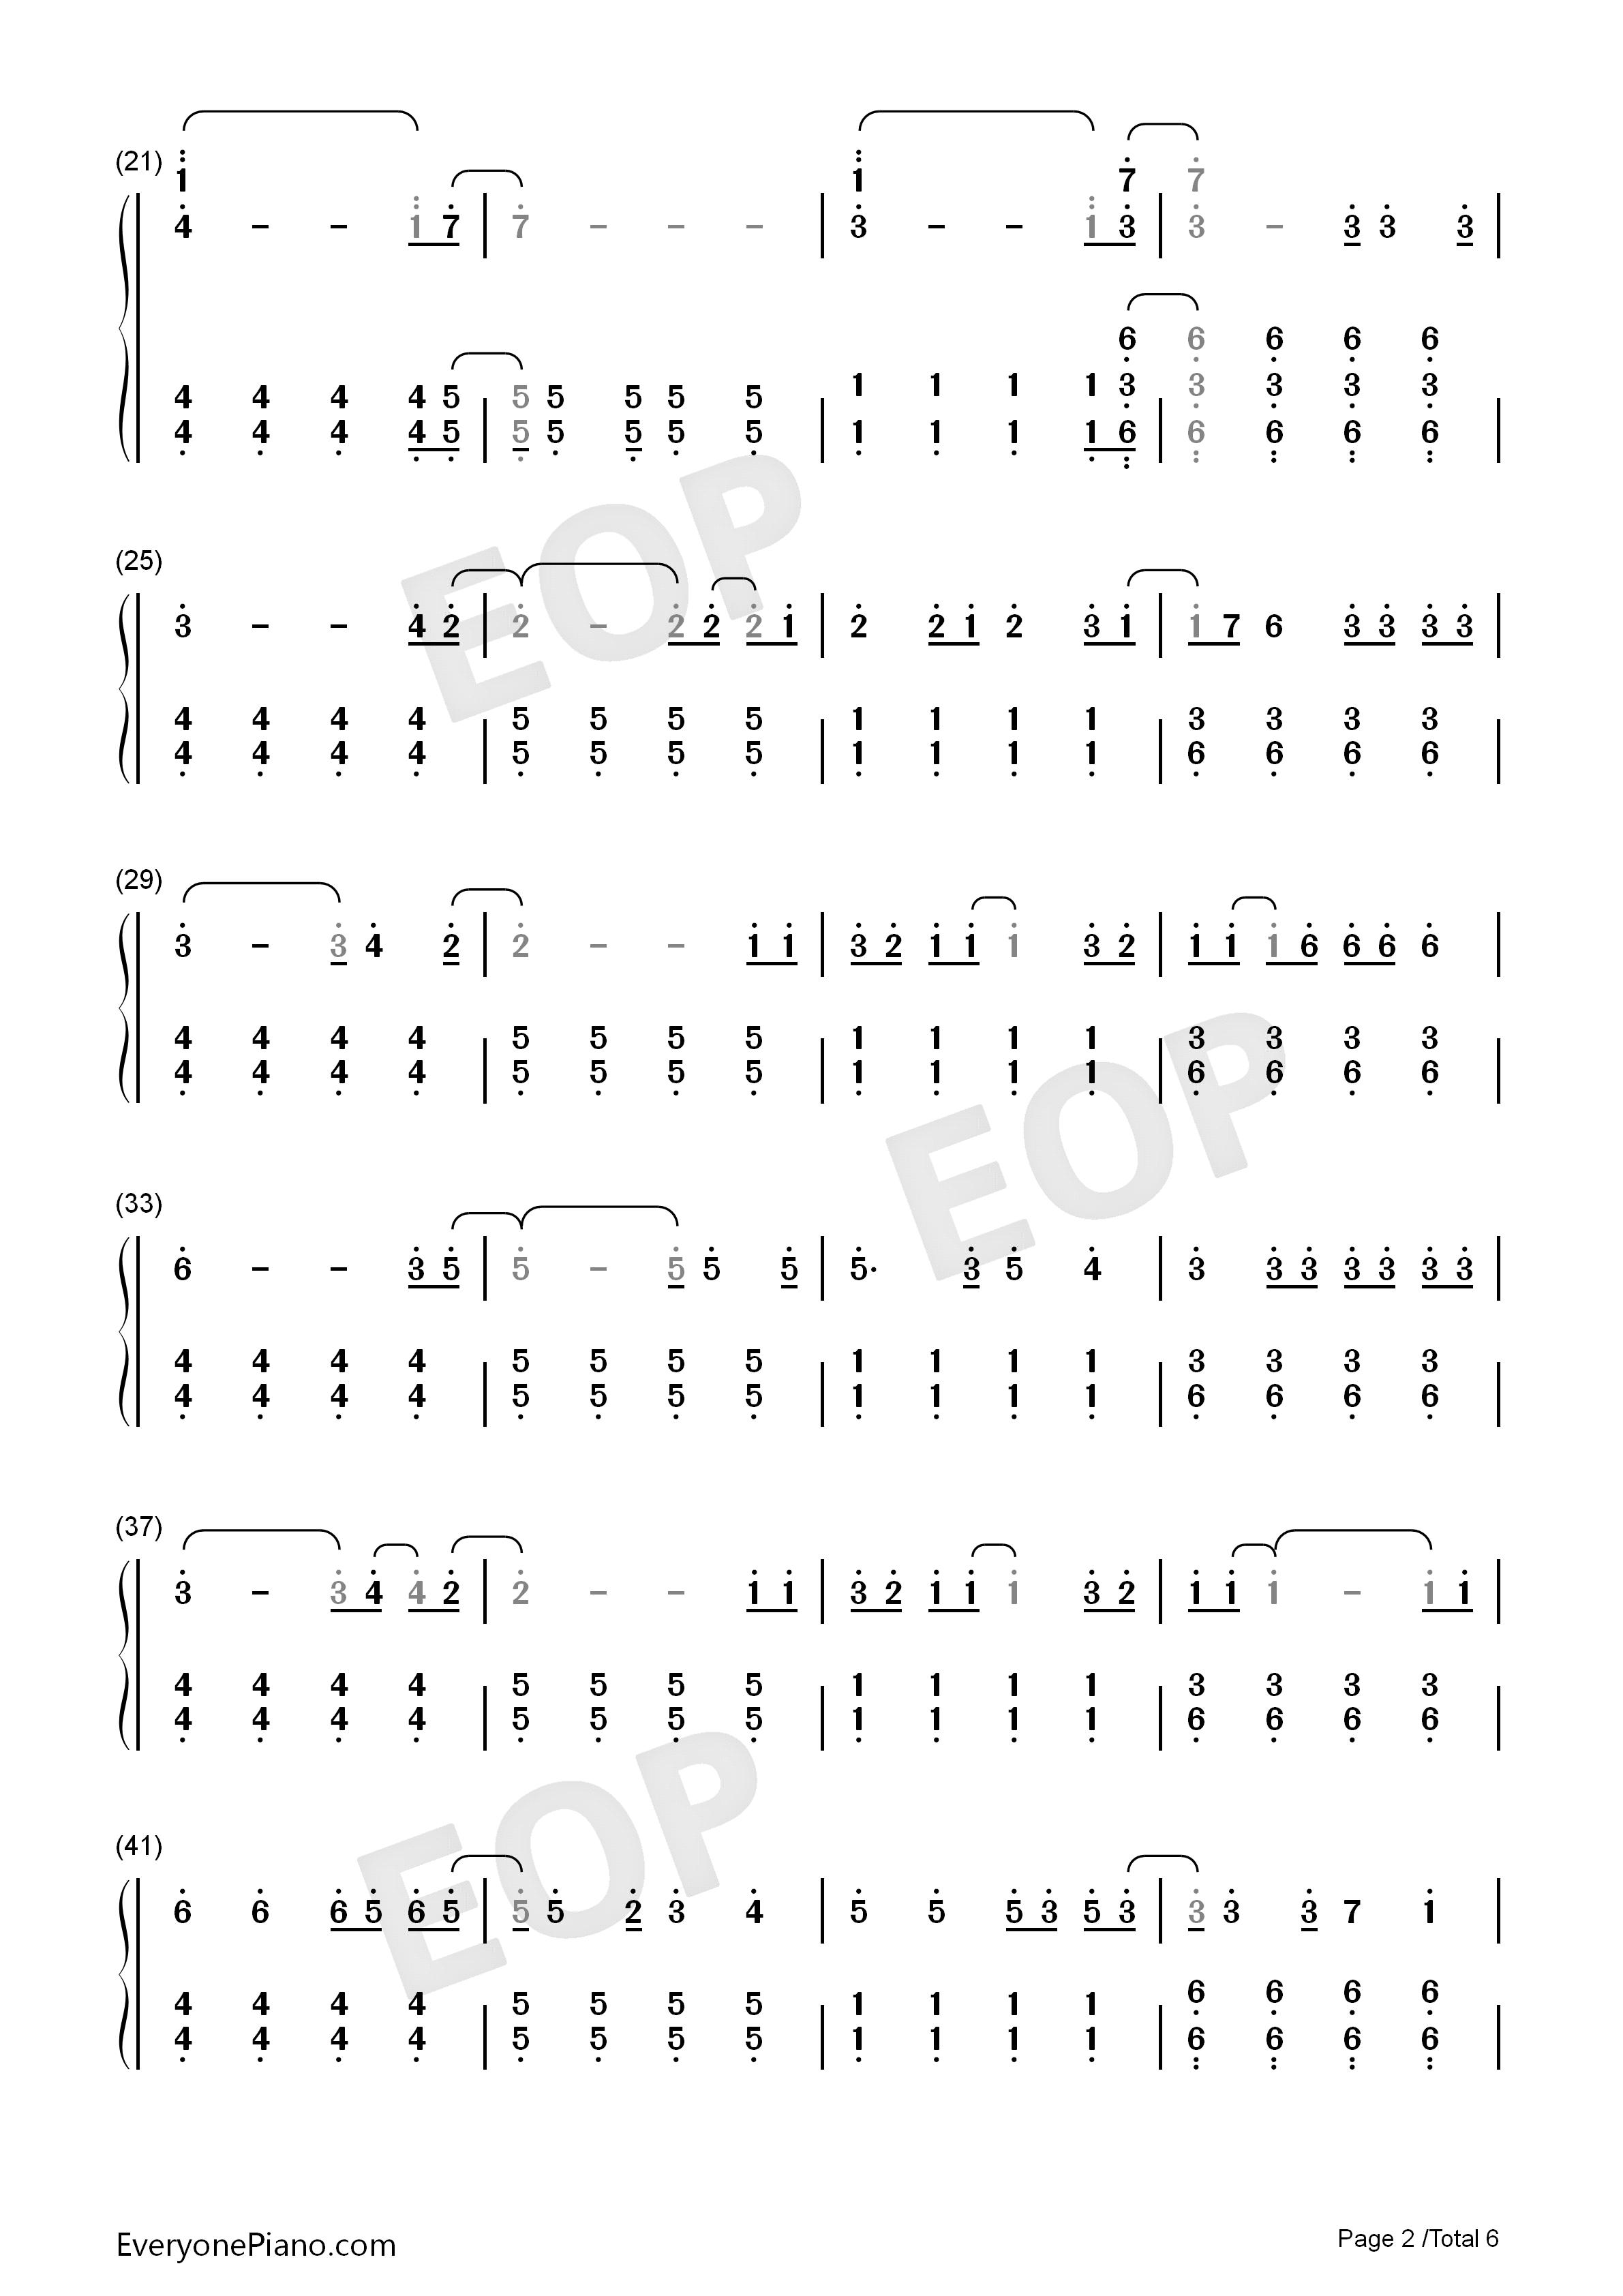 Viva la vida numbered musical notation preview 2 free piano sheet listen now print sheet viva la vida numbered musical notation preview 2 hexwebz Choice Image